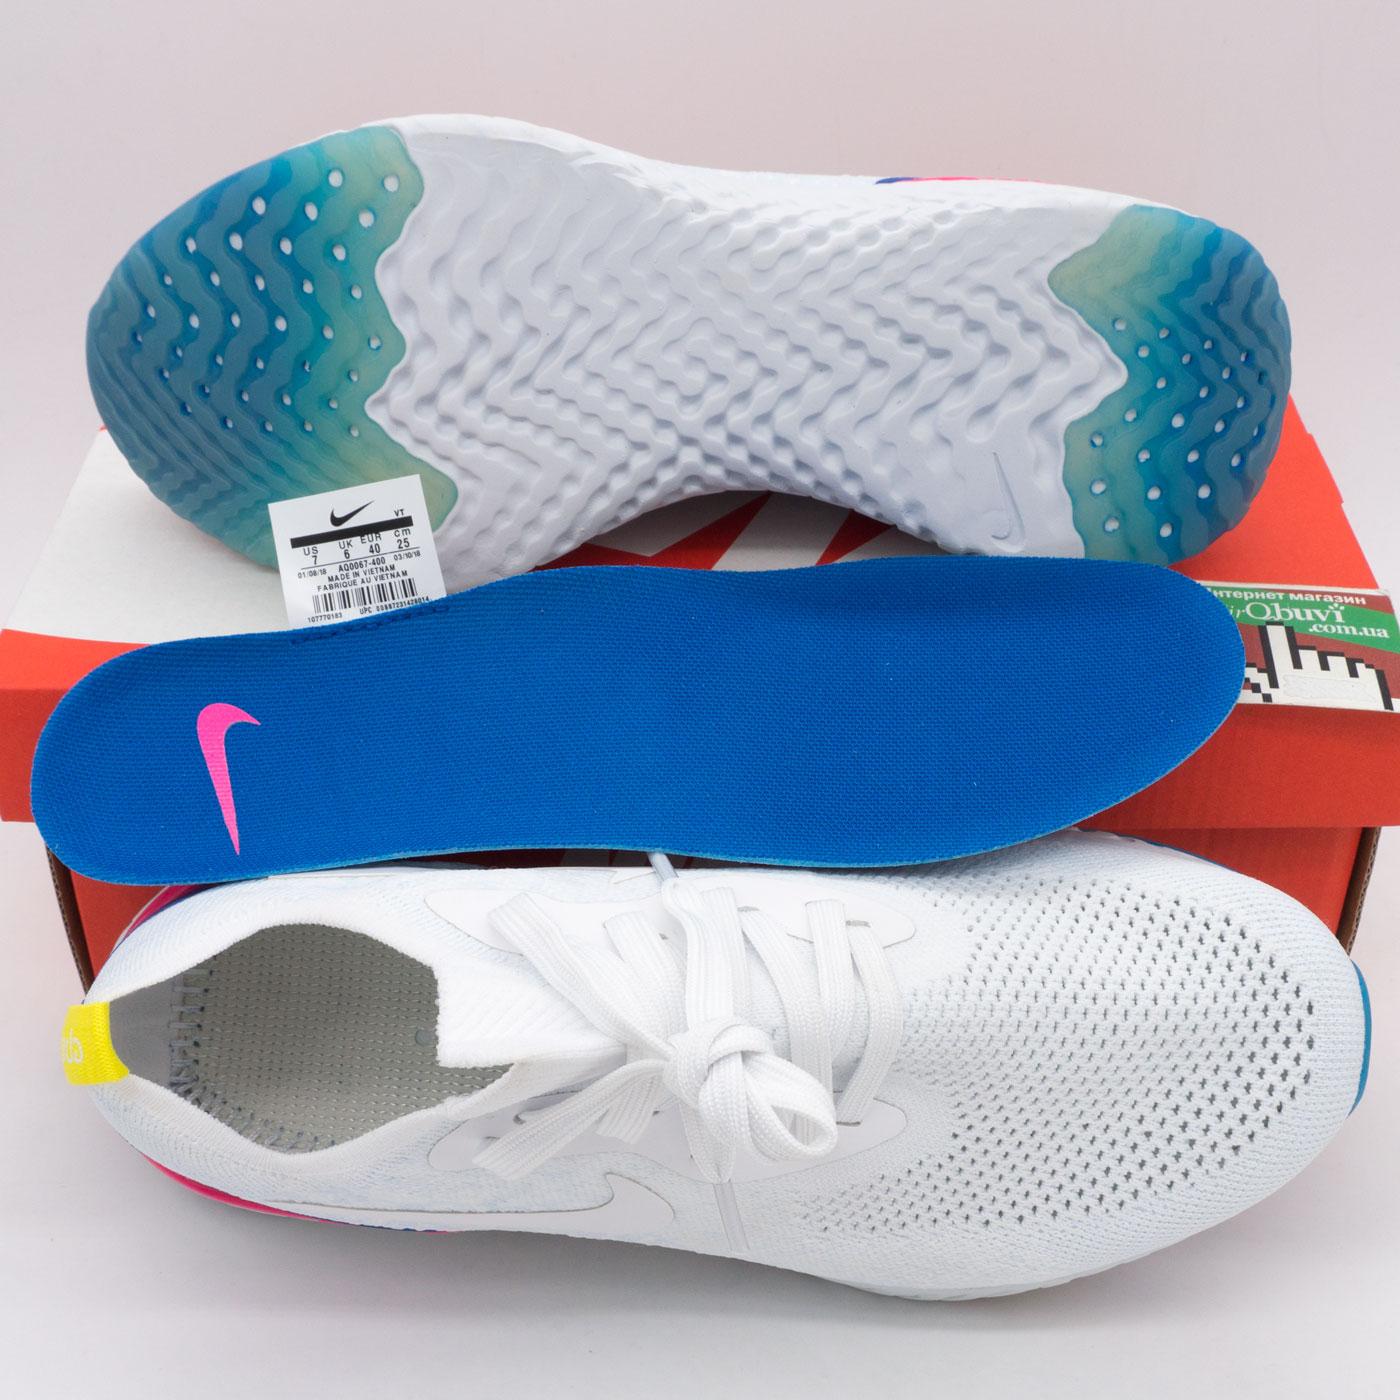 фото bottom Кроссовки для бега Nike Epic React Flyknit белые. Топ качество! bottom